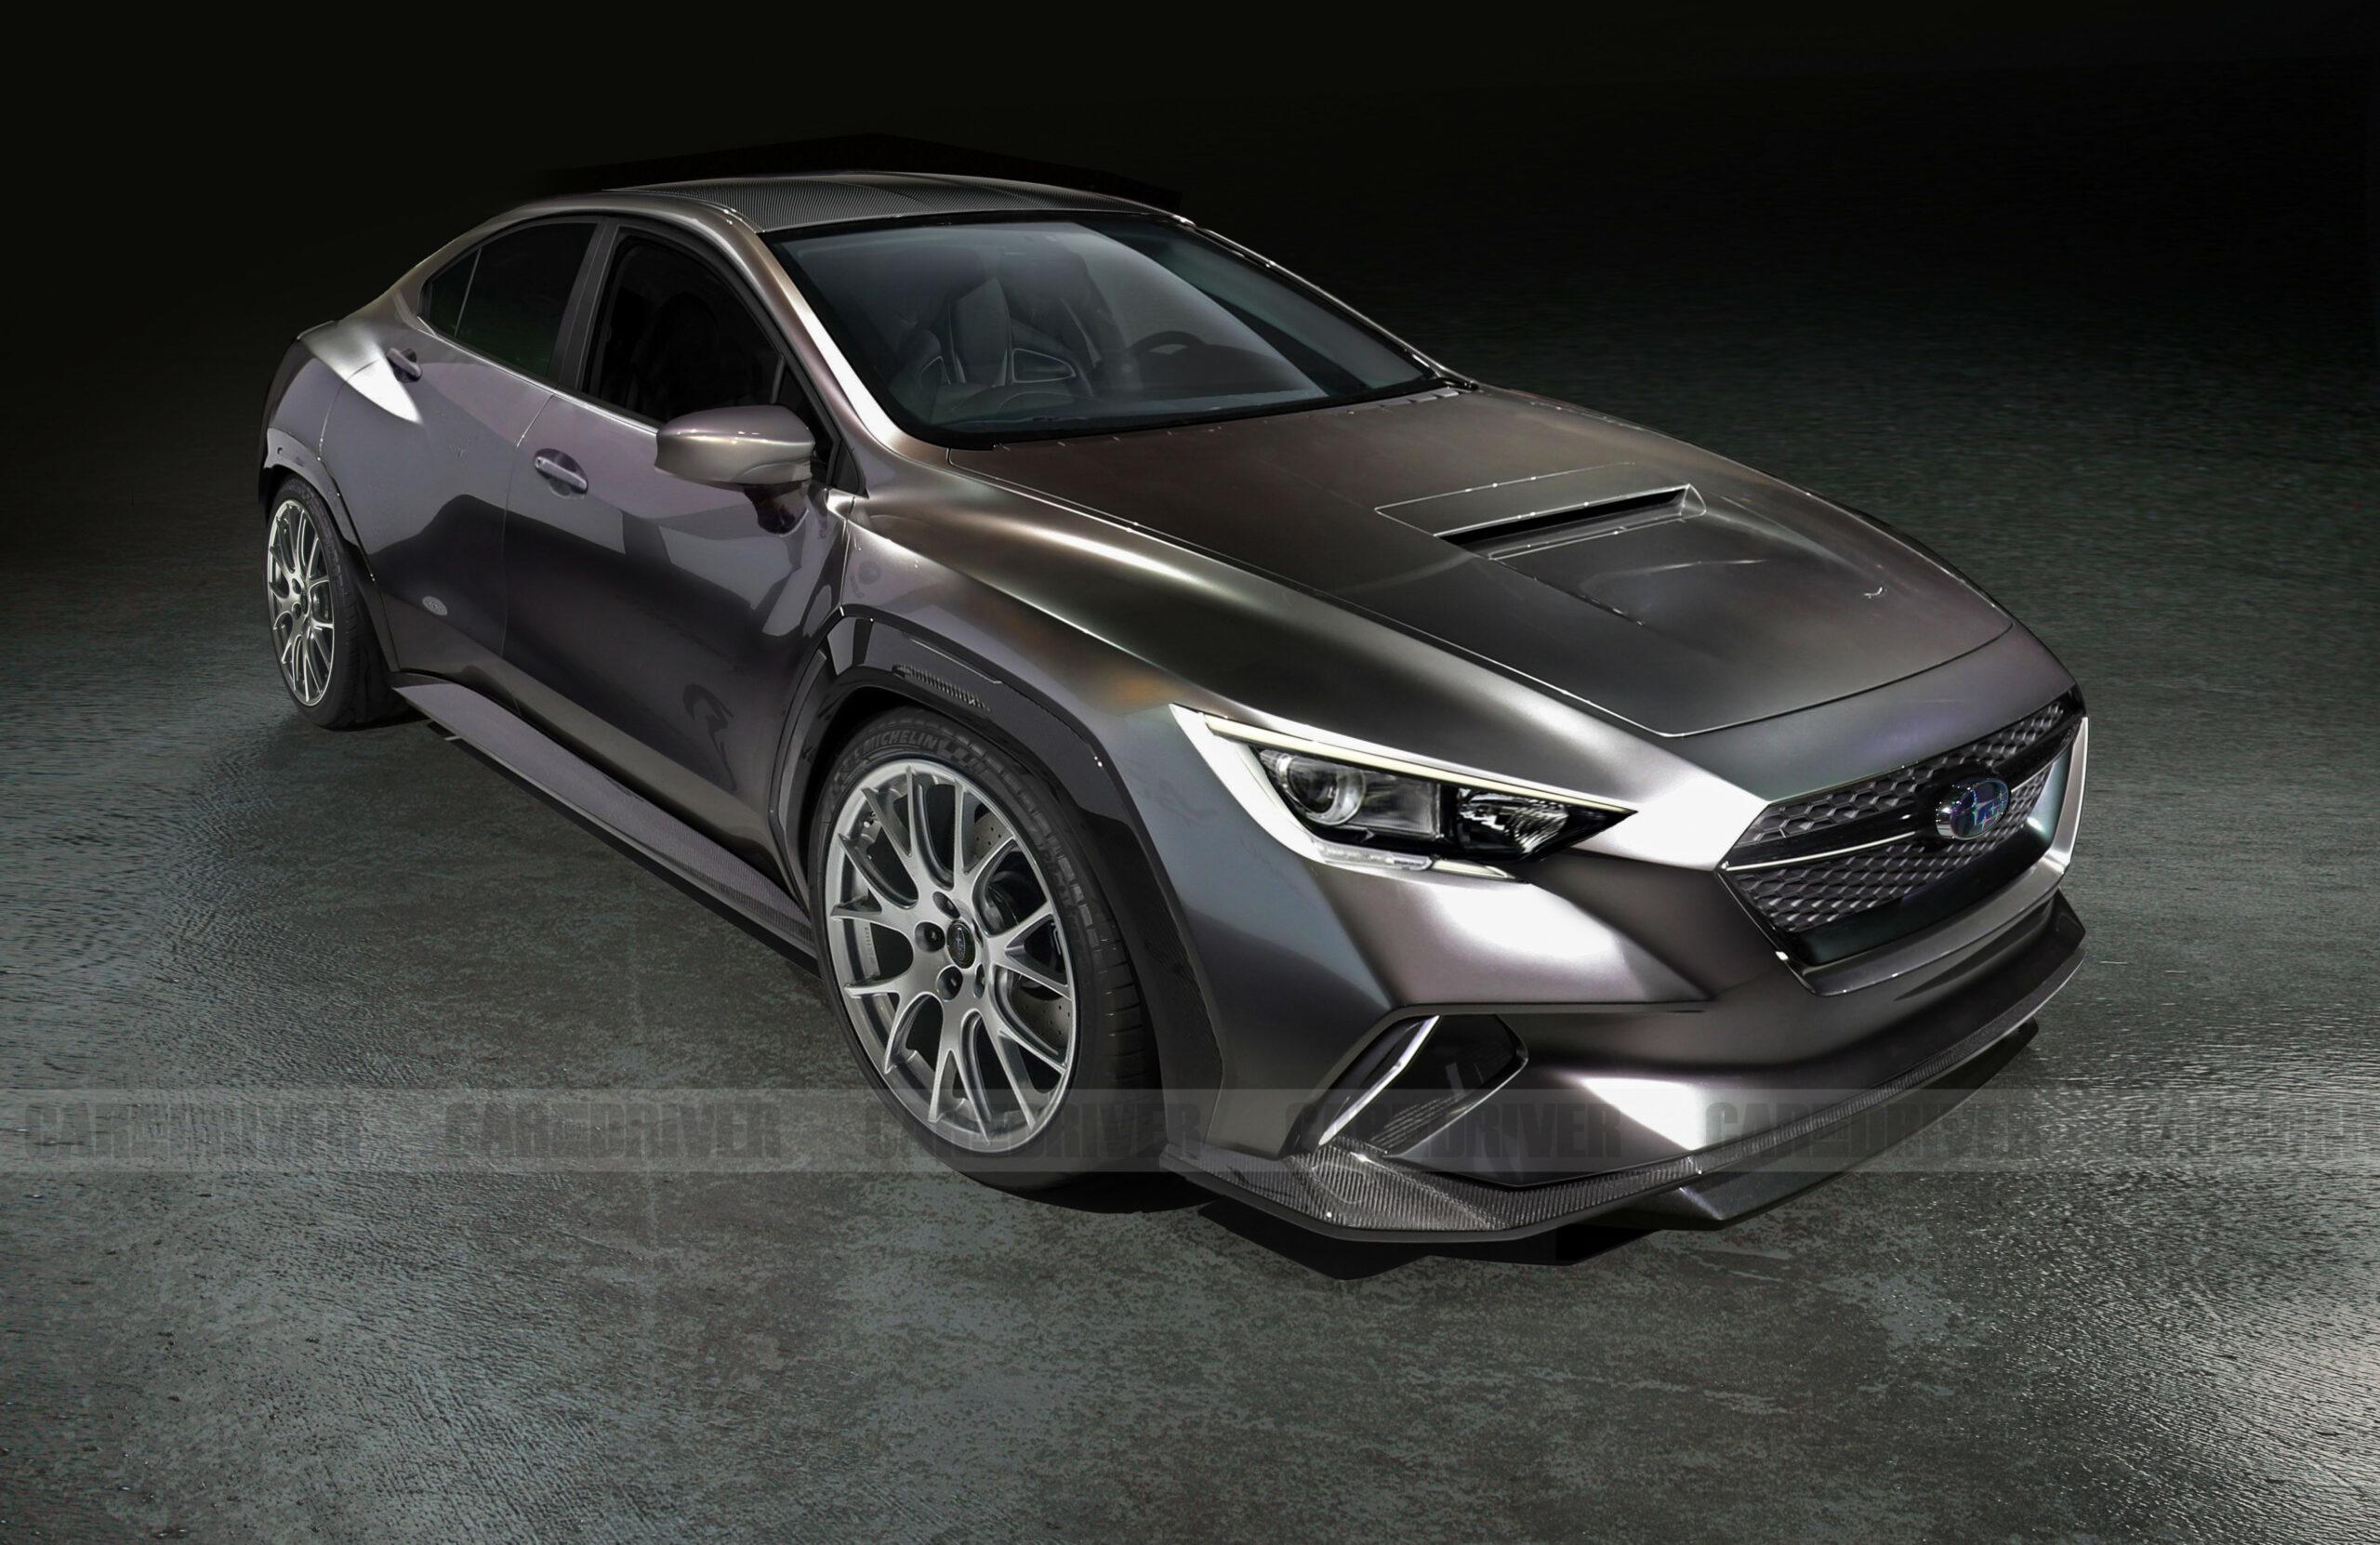 Performance 2022 Subaru Wrx